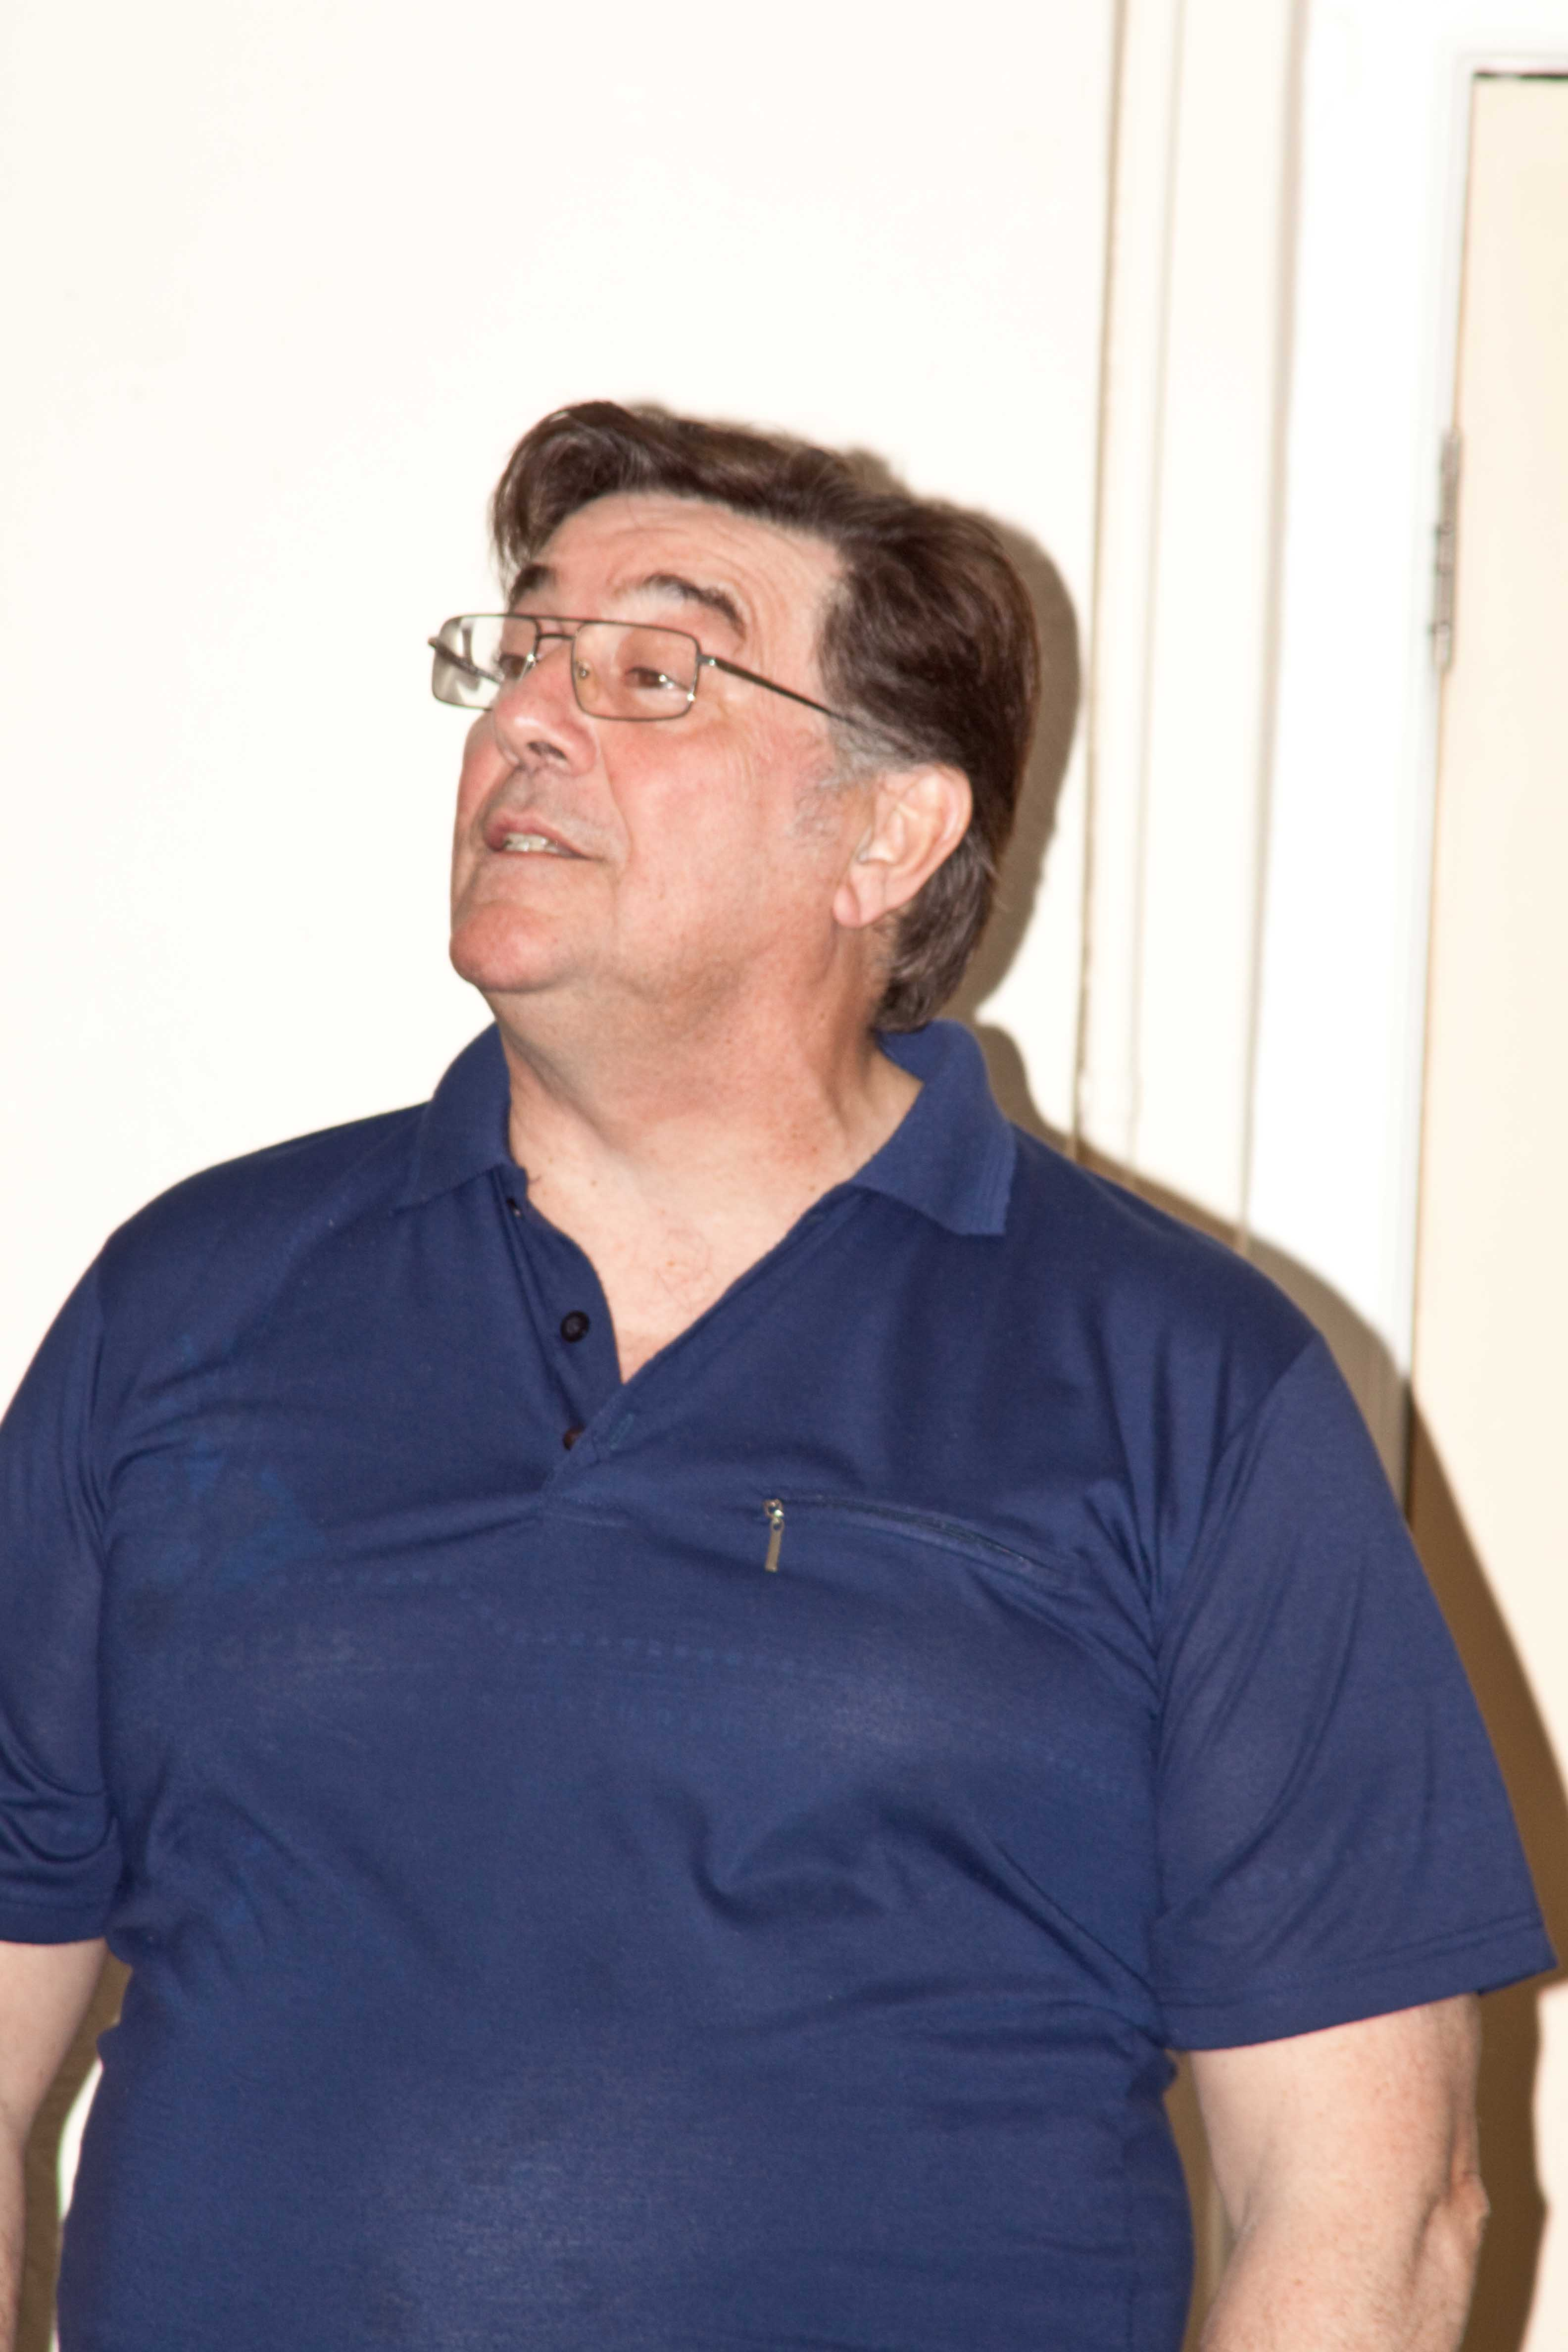 Brian Peckett